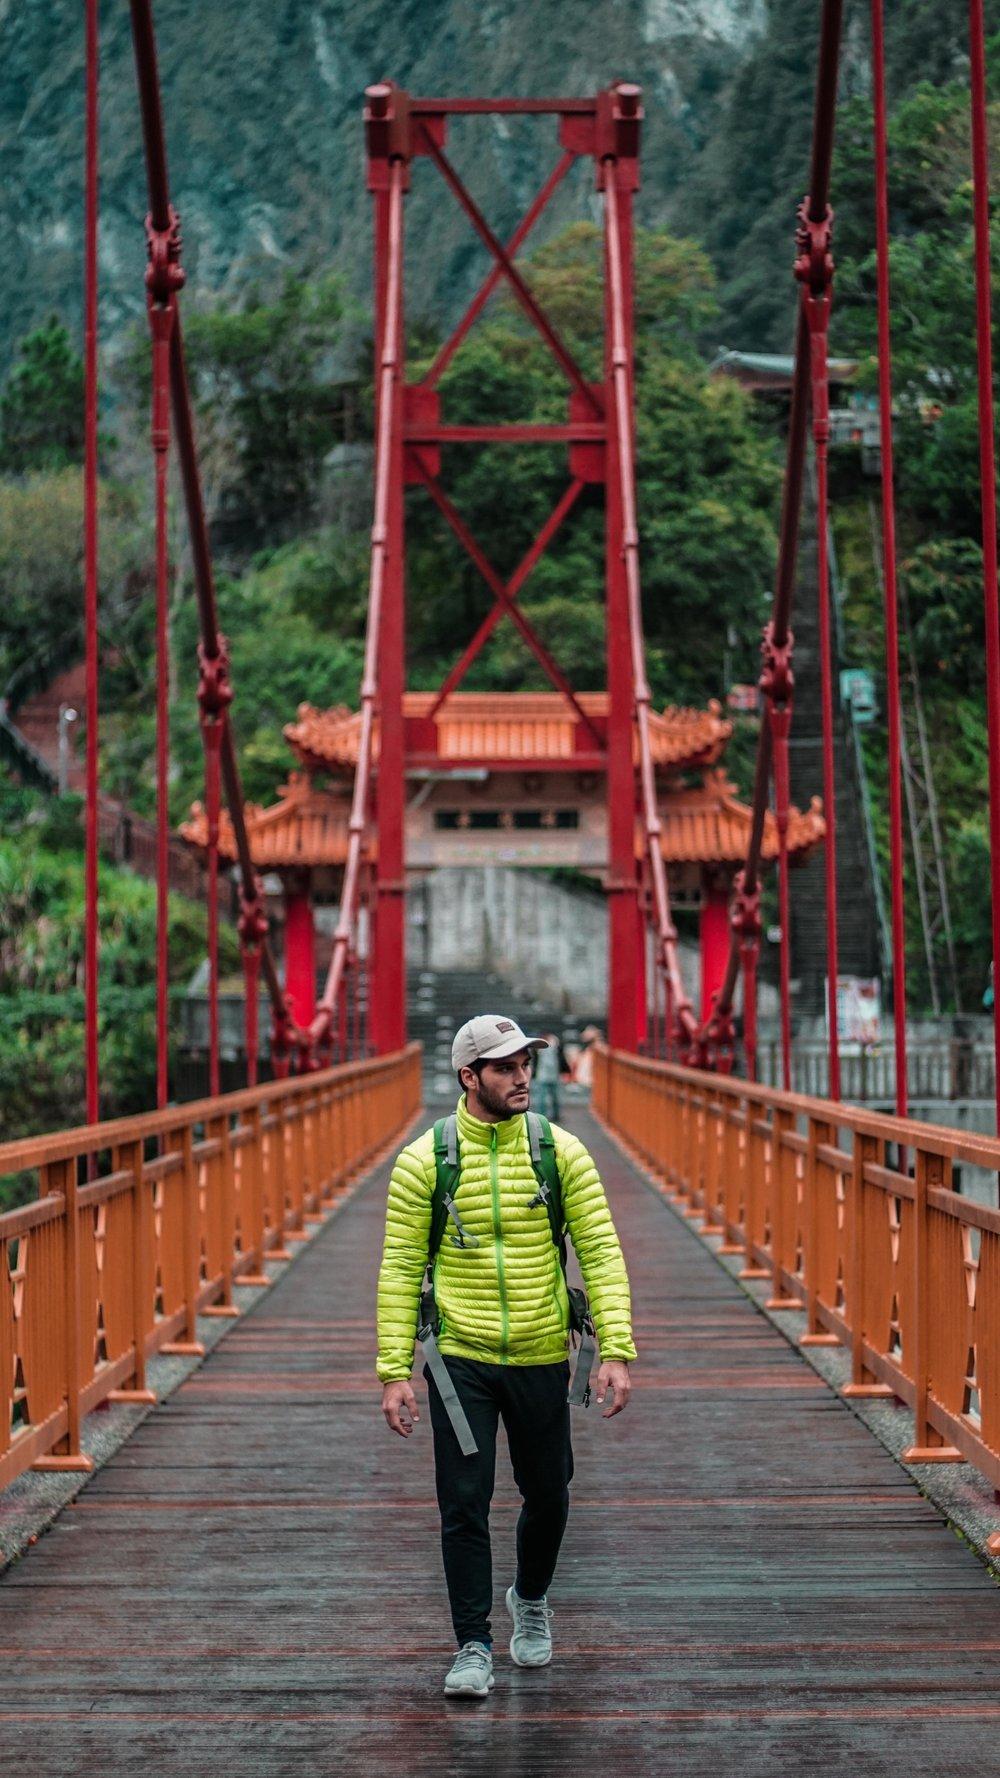 pol_tarres_adventures_taiwan_verticals-14.jpg